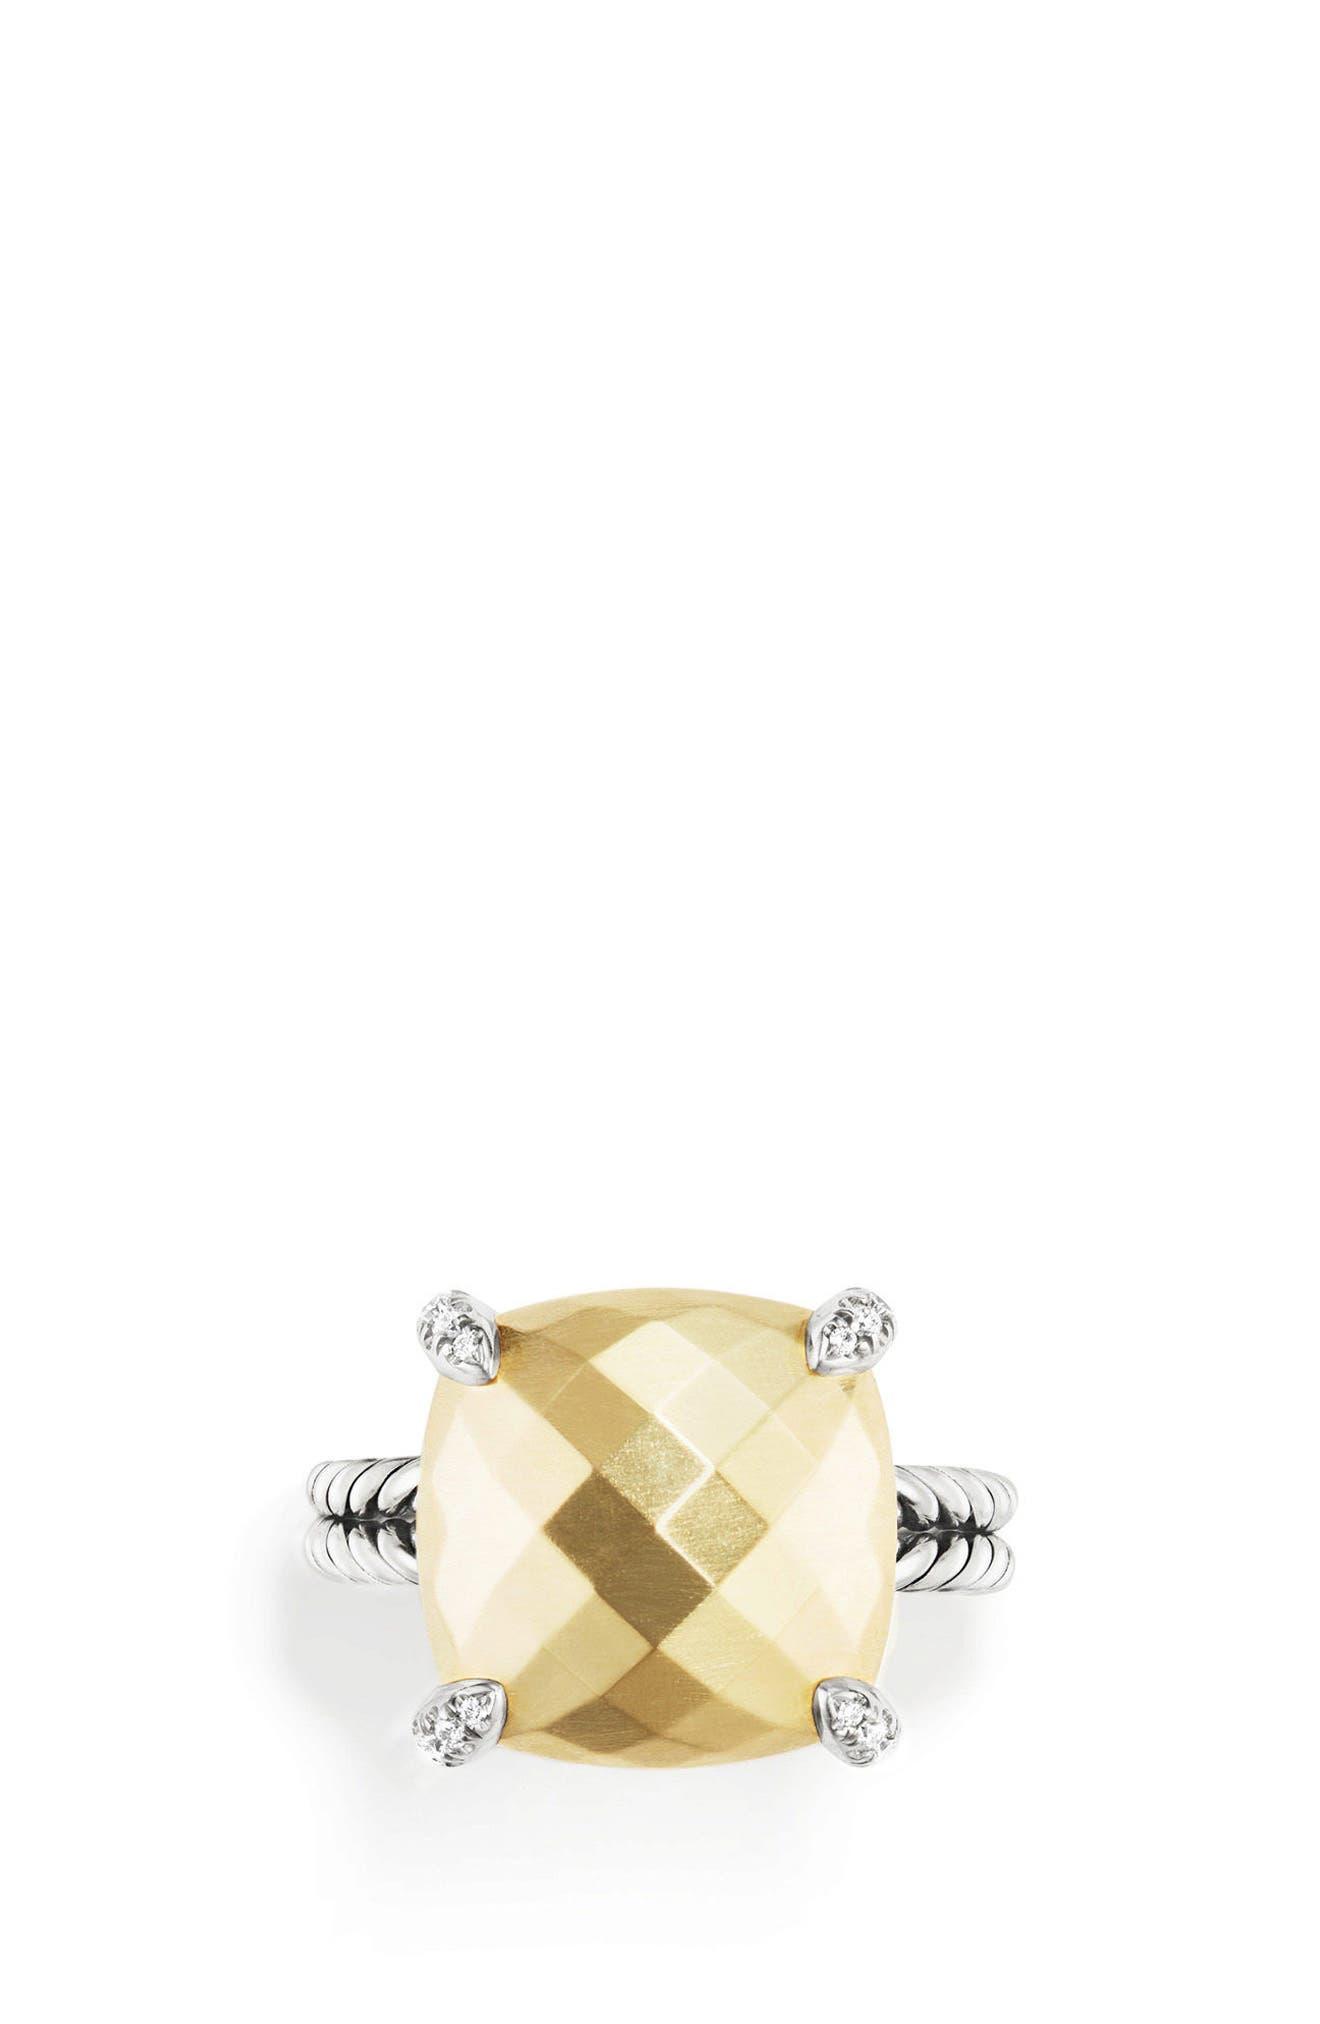 Main Image - David Yurman Chatelaine Ring with 18K Gold and Diamonds